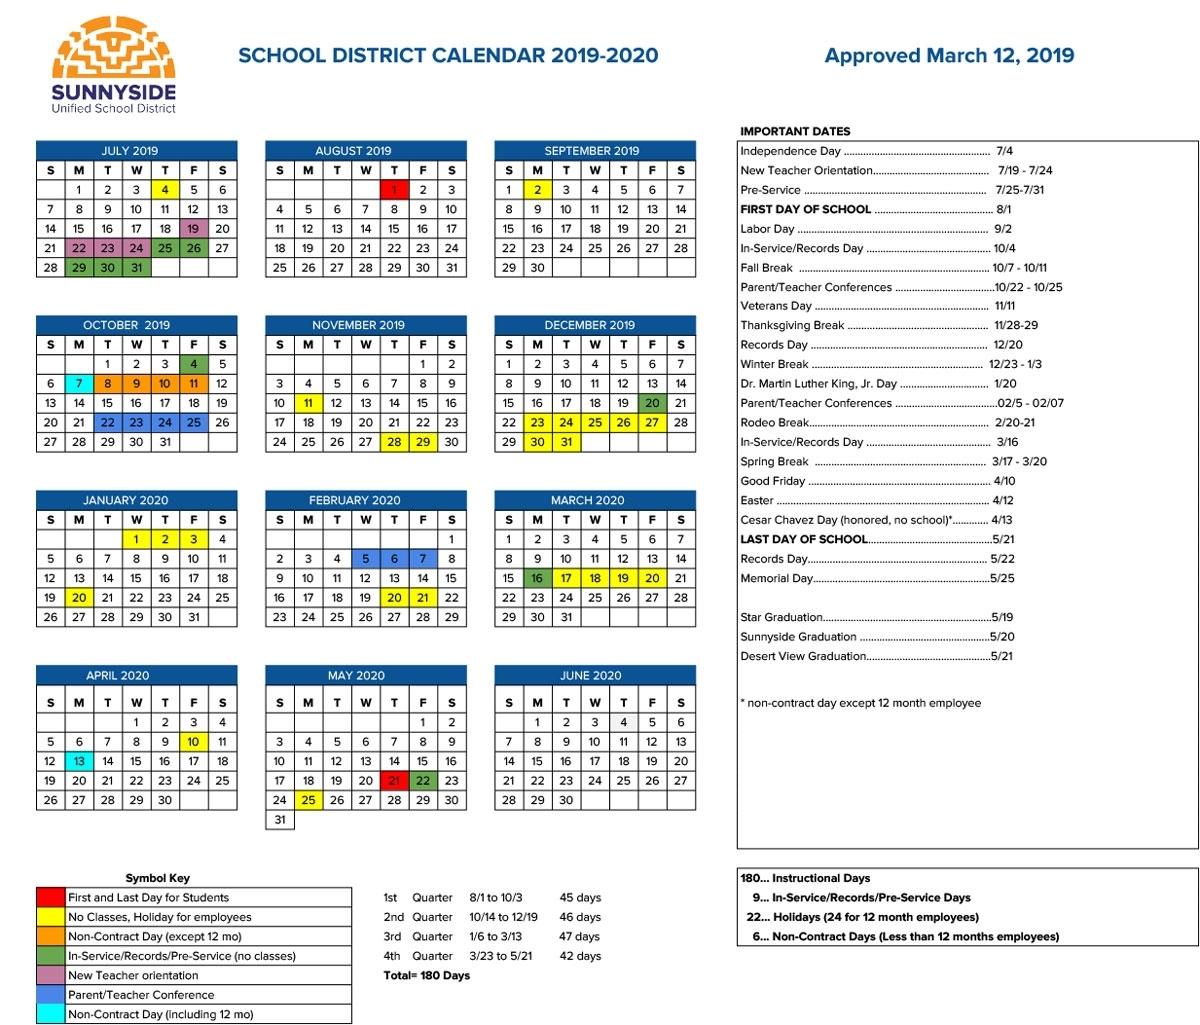 Academic Calendar | Sunnyside Unified School District intended for Google Annual Calendar 2019-2020